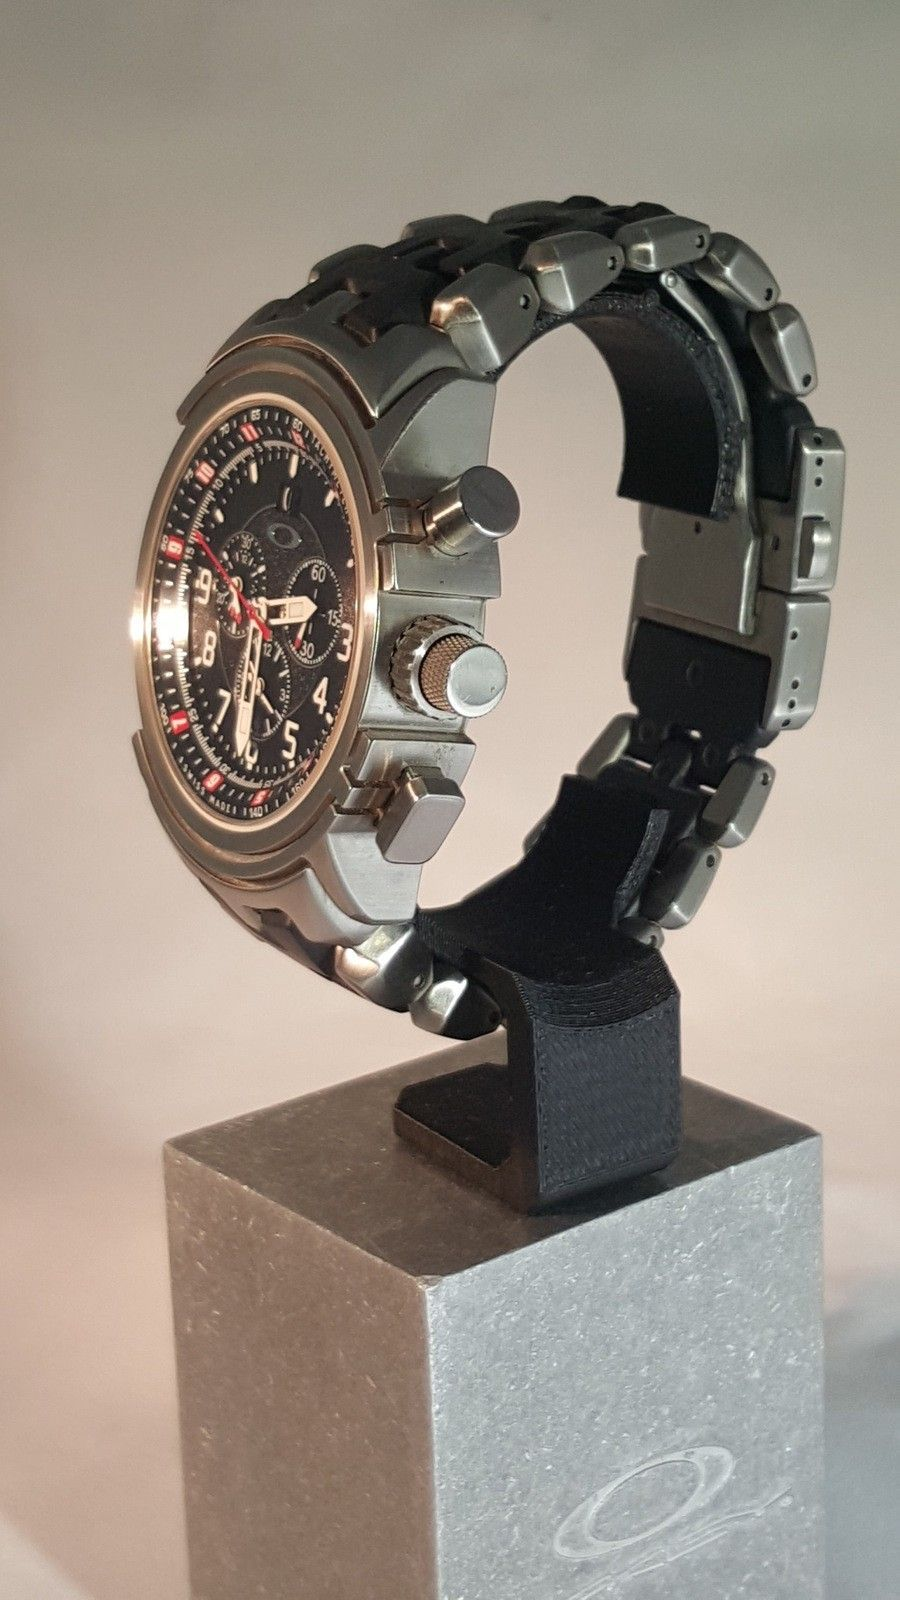 Great Damn Condition - 12 Guage Watch - 500. + Watch Valut - 20151203_132858.jpg.jpeg